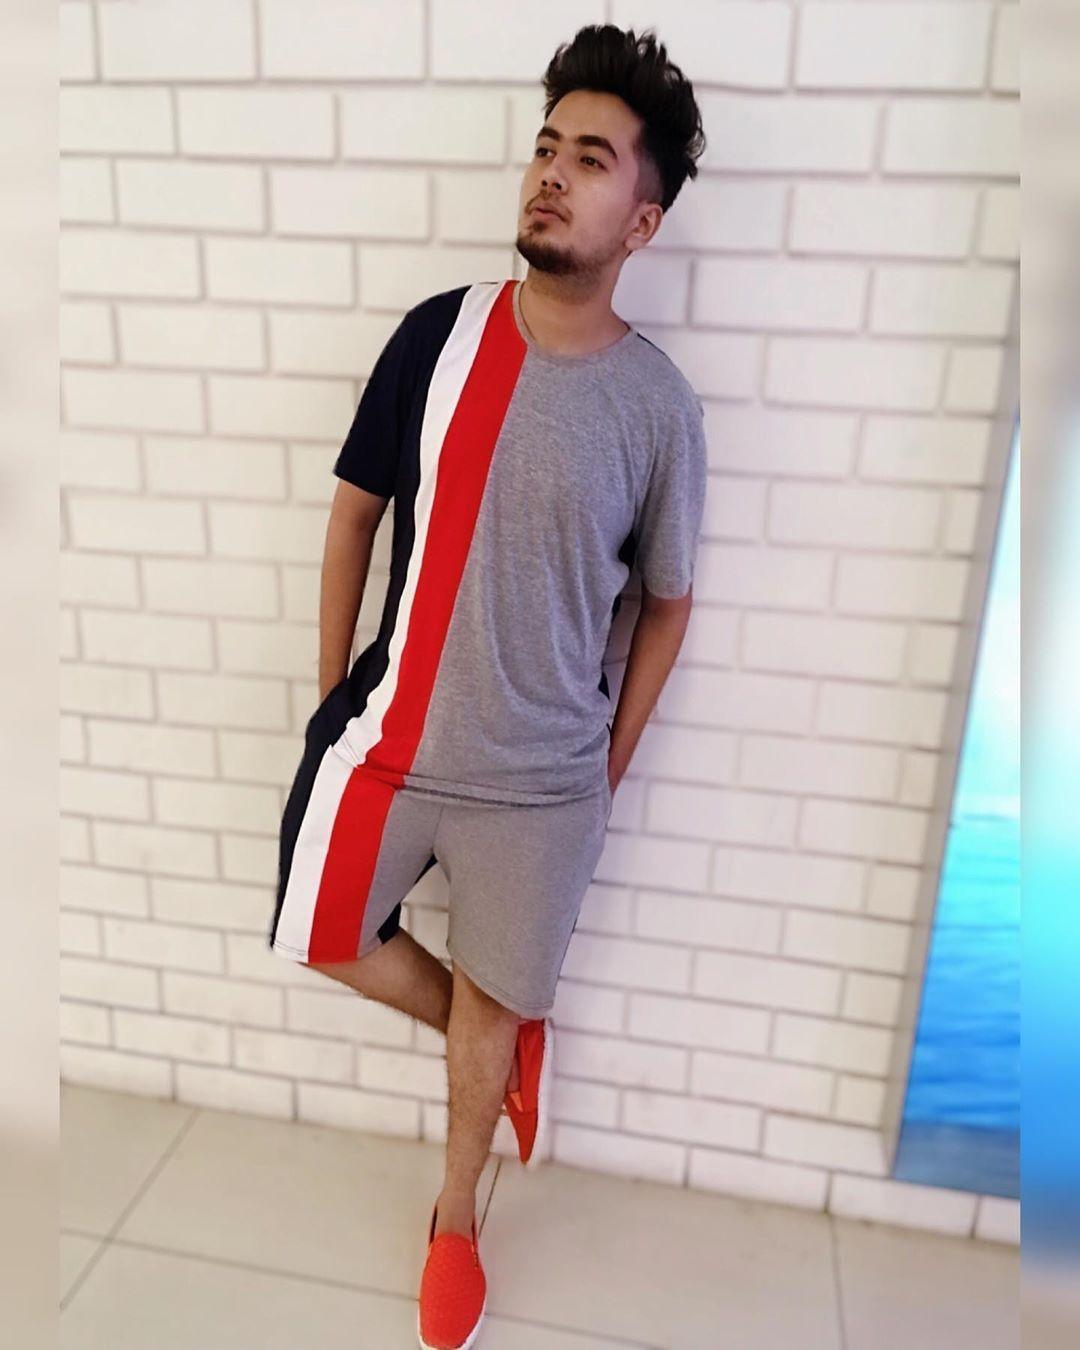 """Cuando amor no es locura no es amor. (When love is not madness it is not love.)"" - Danish proverb  #amanhighonlife #fashionmen #menfashionreview #menshair #mensfashion #fashionmens #hairmenstyle #menstreetstyle #fashionmenswear #menfashionblogger #mensweardaily #highfashionmen #menstylefashion #mensfashionreport #highfashionmen @fugazeeinc #fugazee #fugazeeinc  #mensstyle #mensoutfit #menwithstreetstyle #menhairstyles #mensstyleblog #menfashioner #menshairfashion #streetwear #highfashionmen #me"